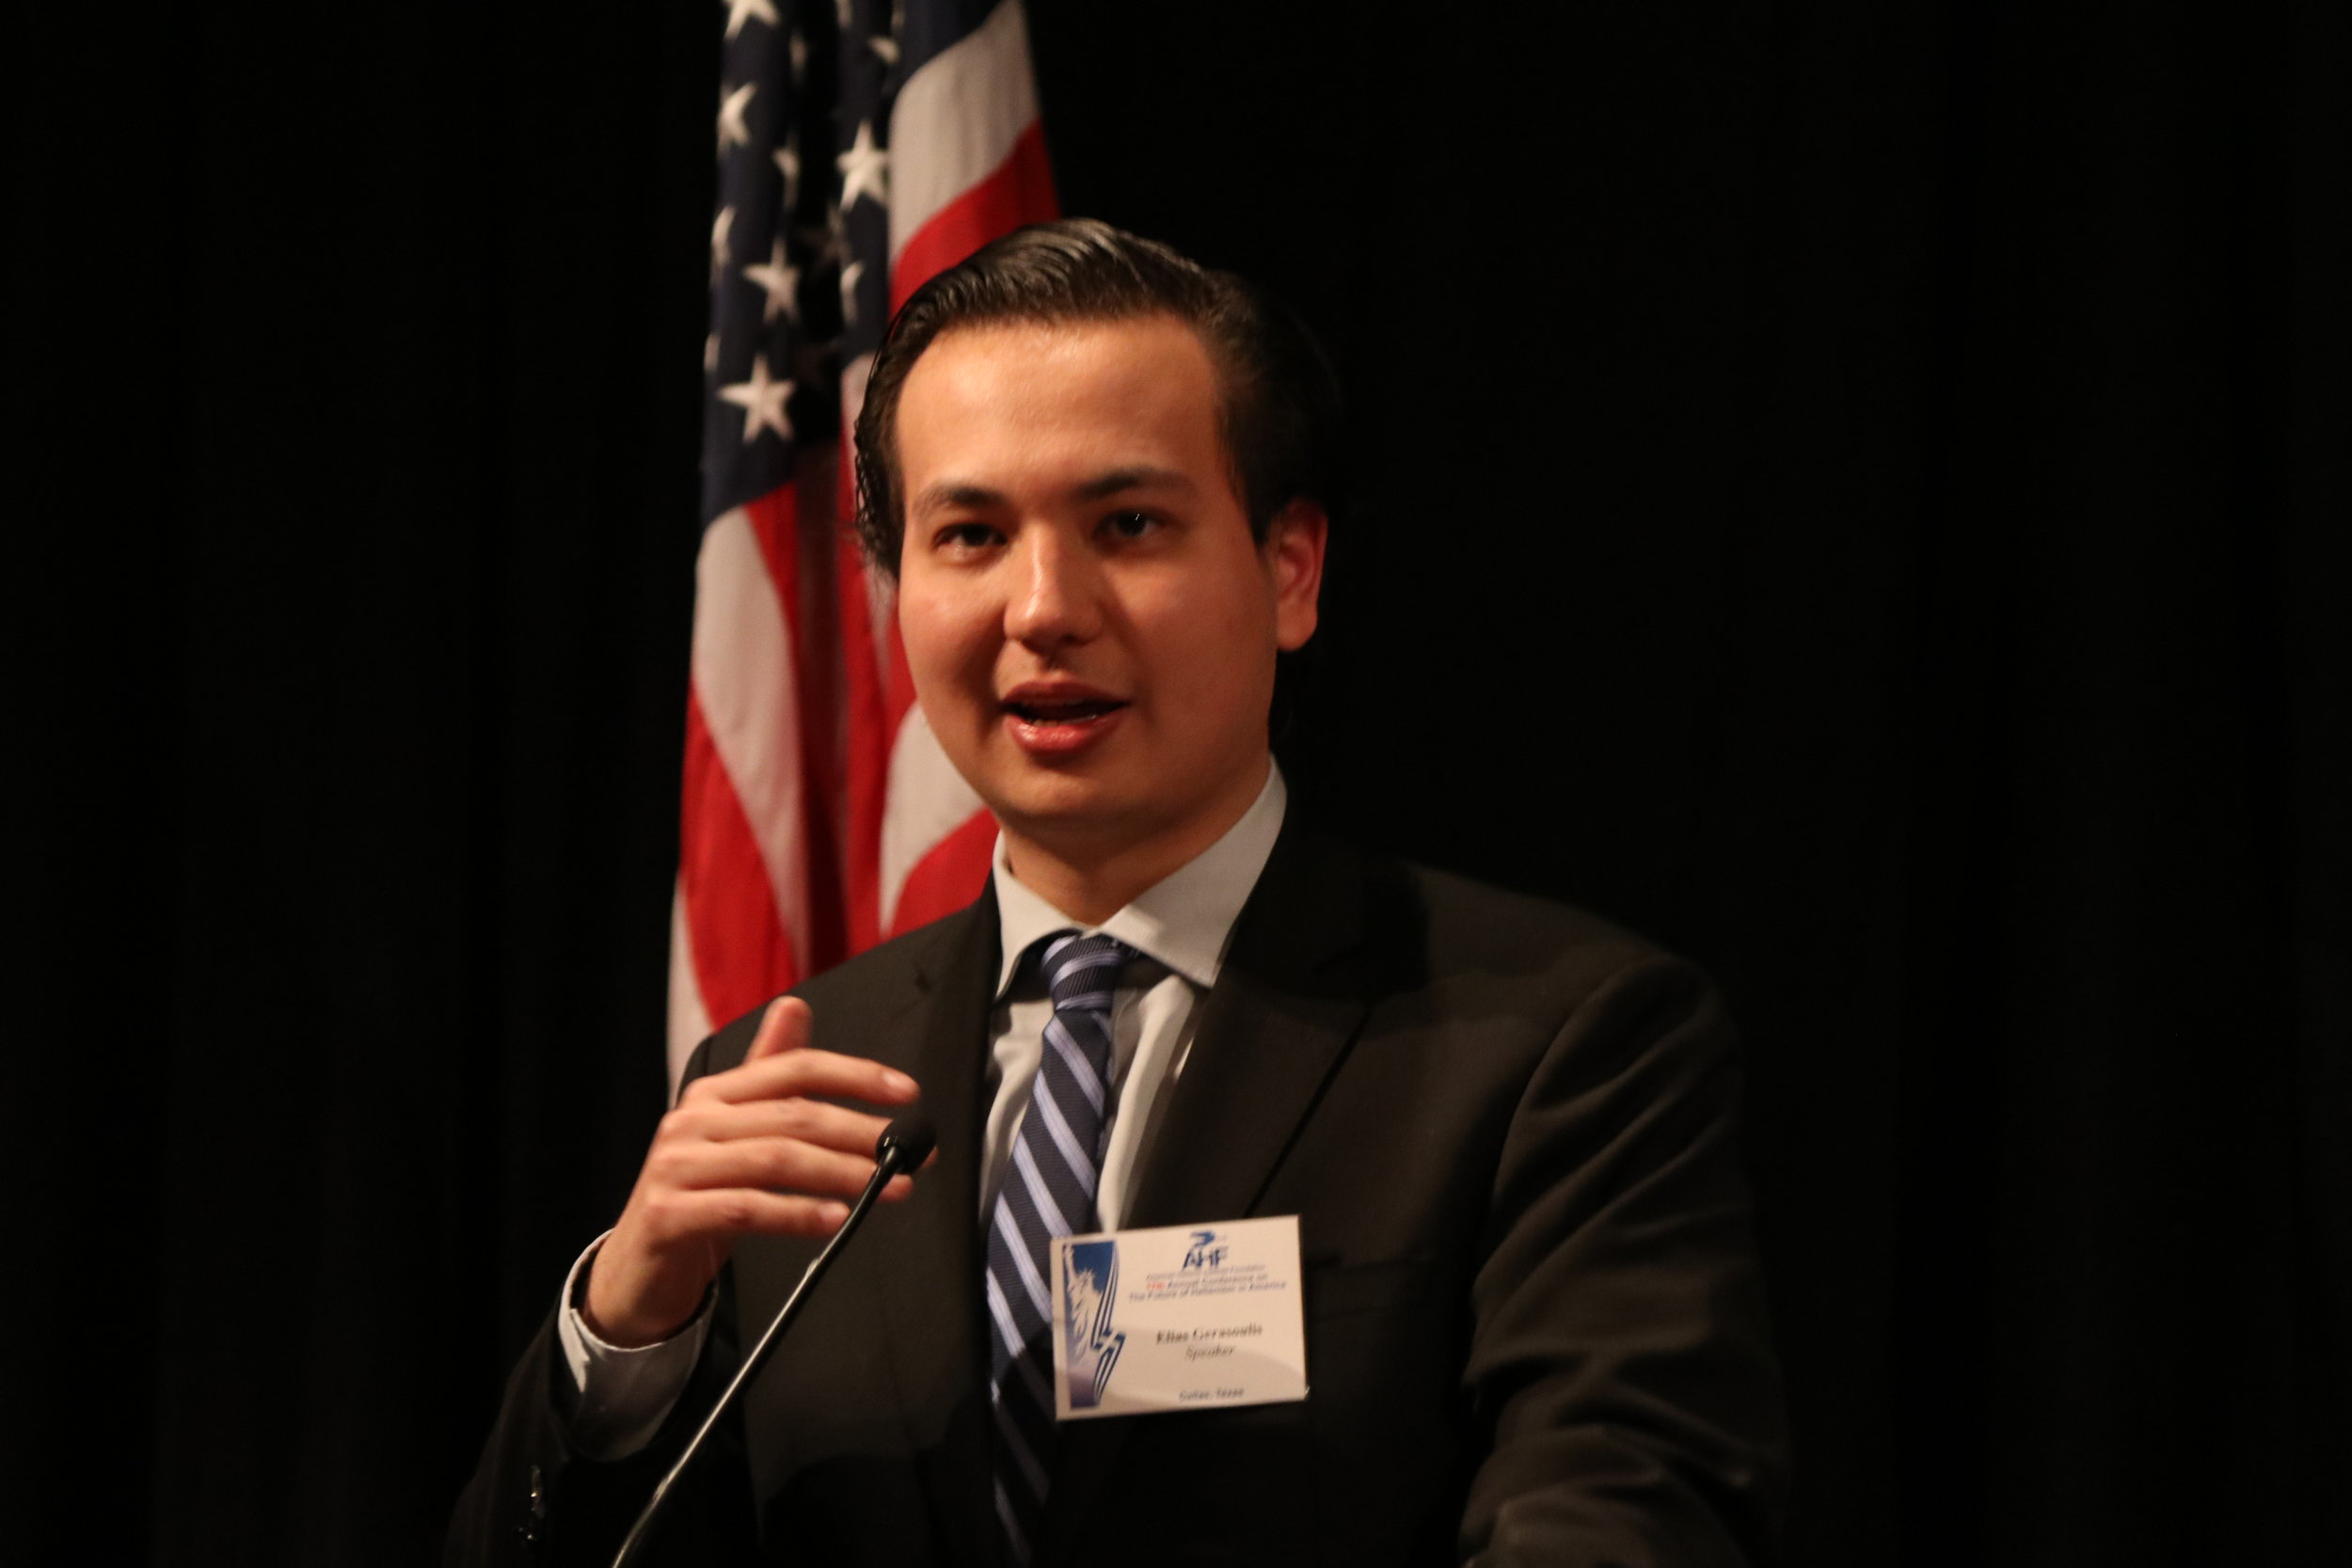 Elias Gerasoulis, AHI legislative assistant.